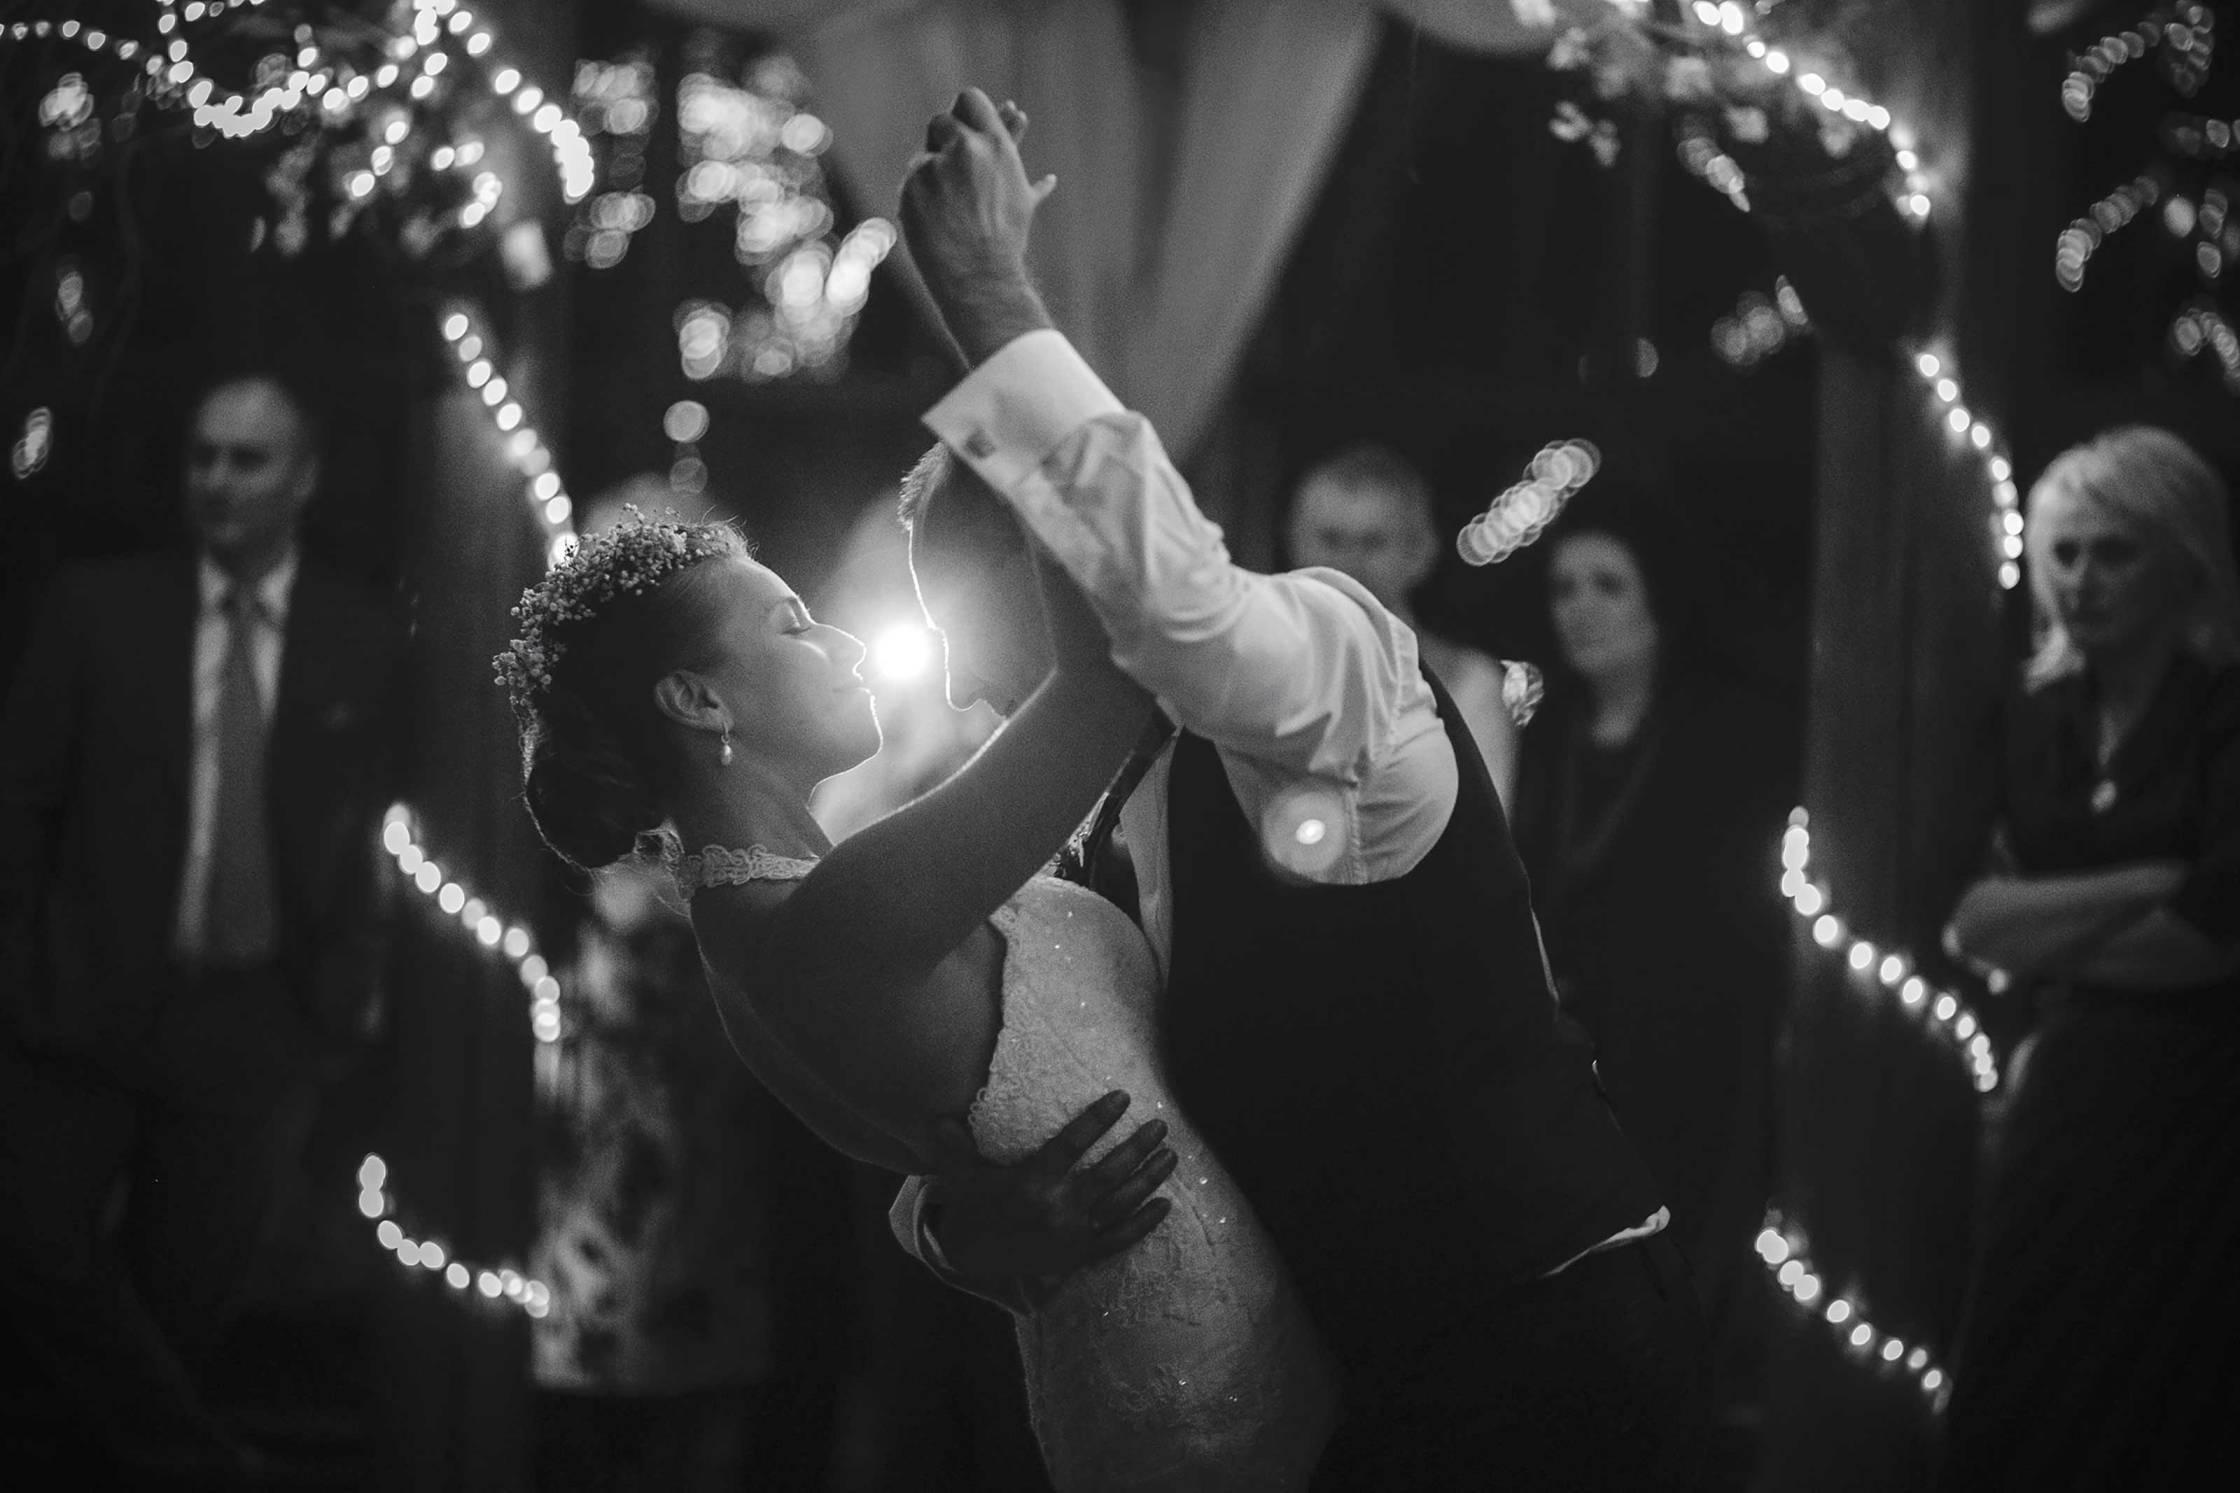 Prvi ples - pjesma